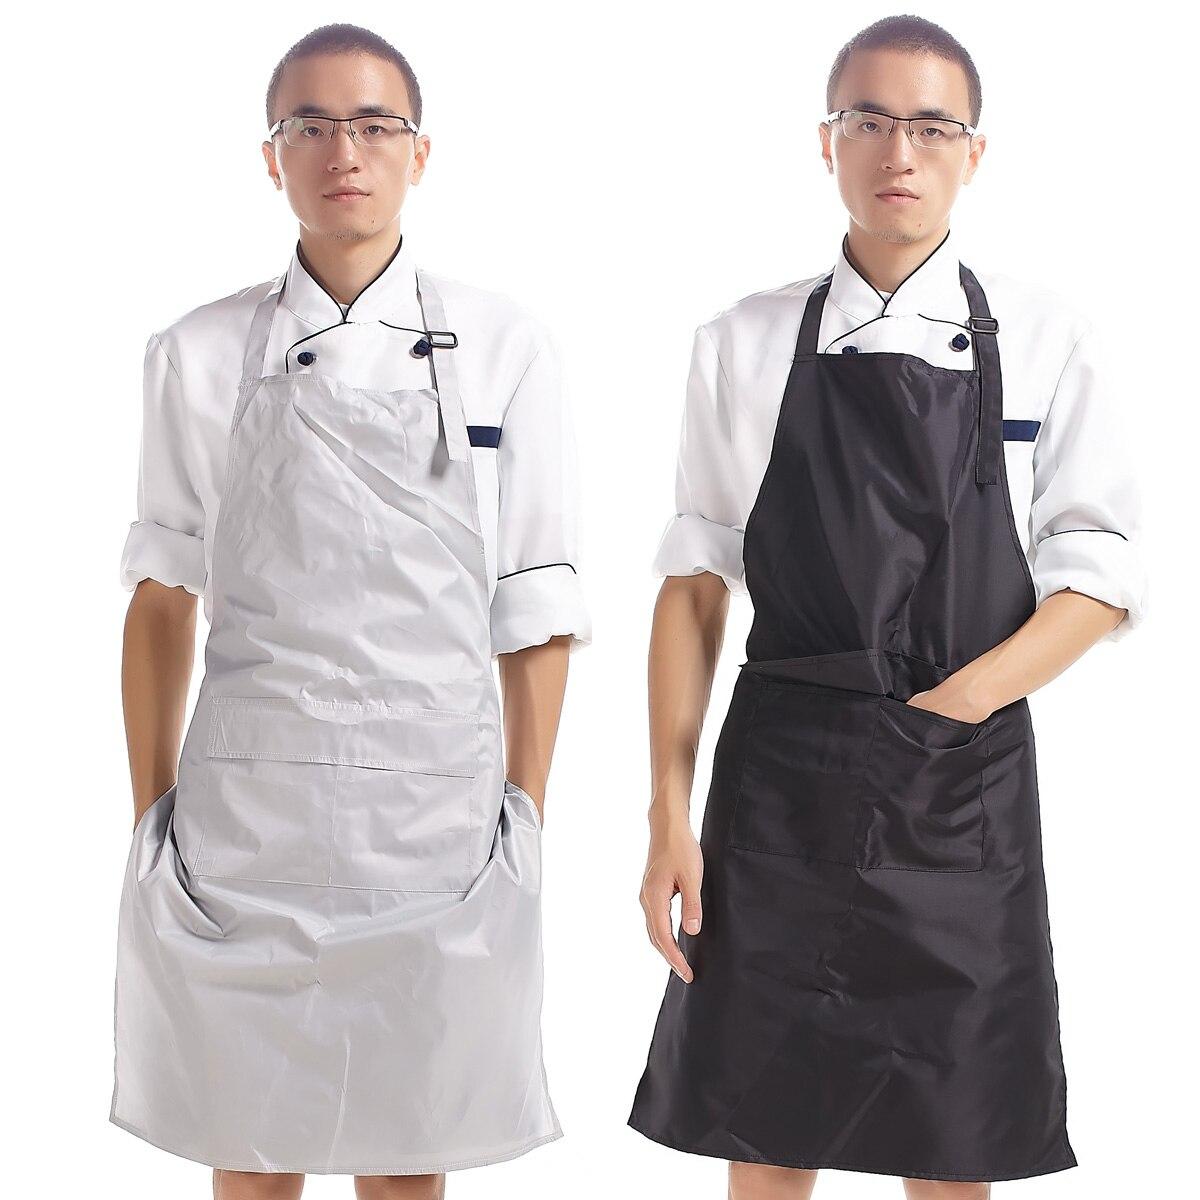 White apron restaurant - 2016 Hot Hot Women Cute Cartoon Waterproof Apron Kitchen Restaurant Cooking Bib Aprons China